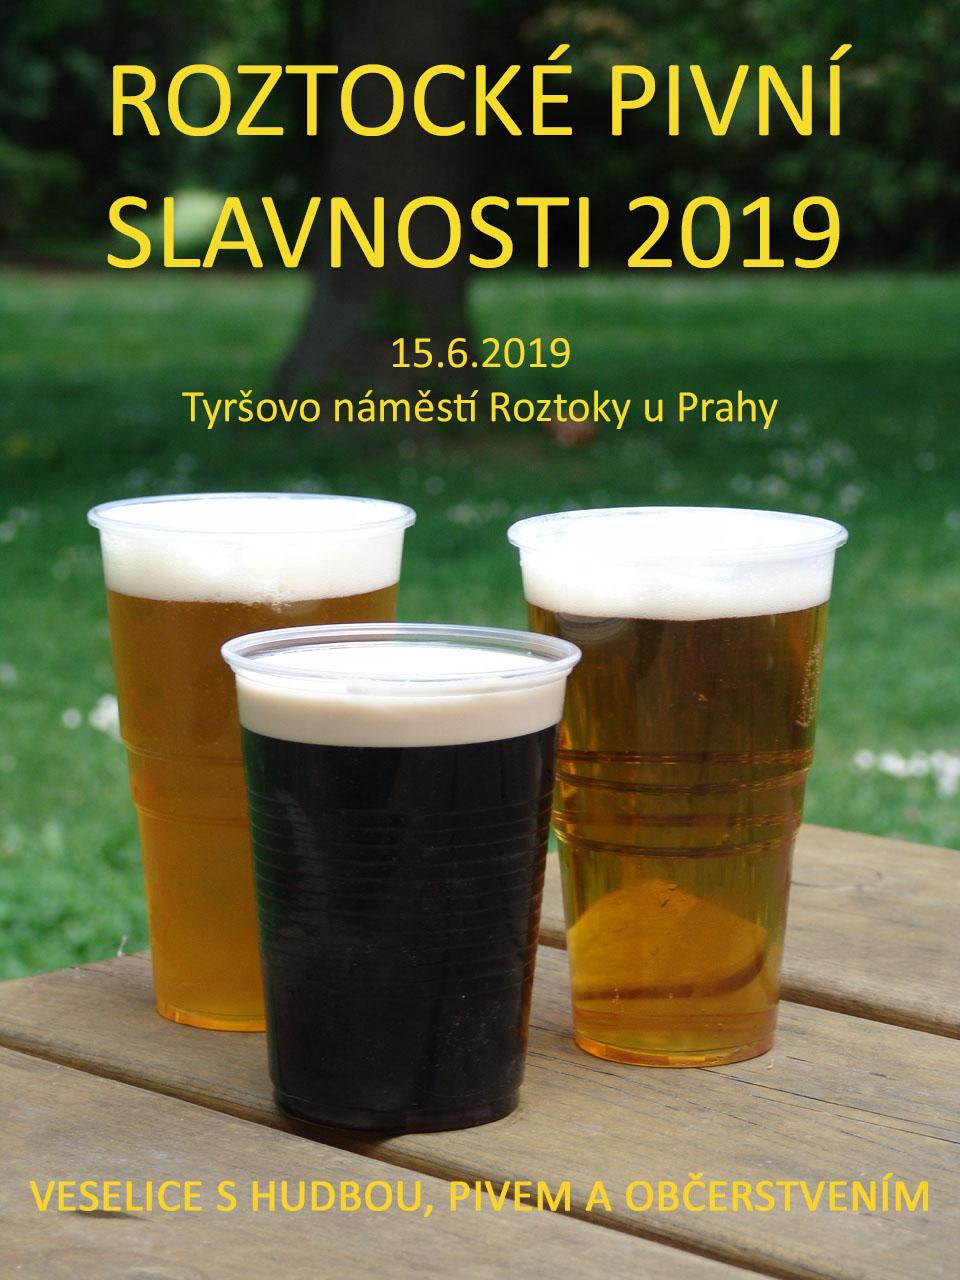 pivovari-pivovary-pivni-akce-roztocke-pivni-slavnosti-2019